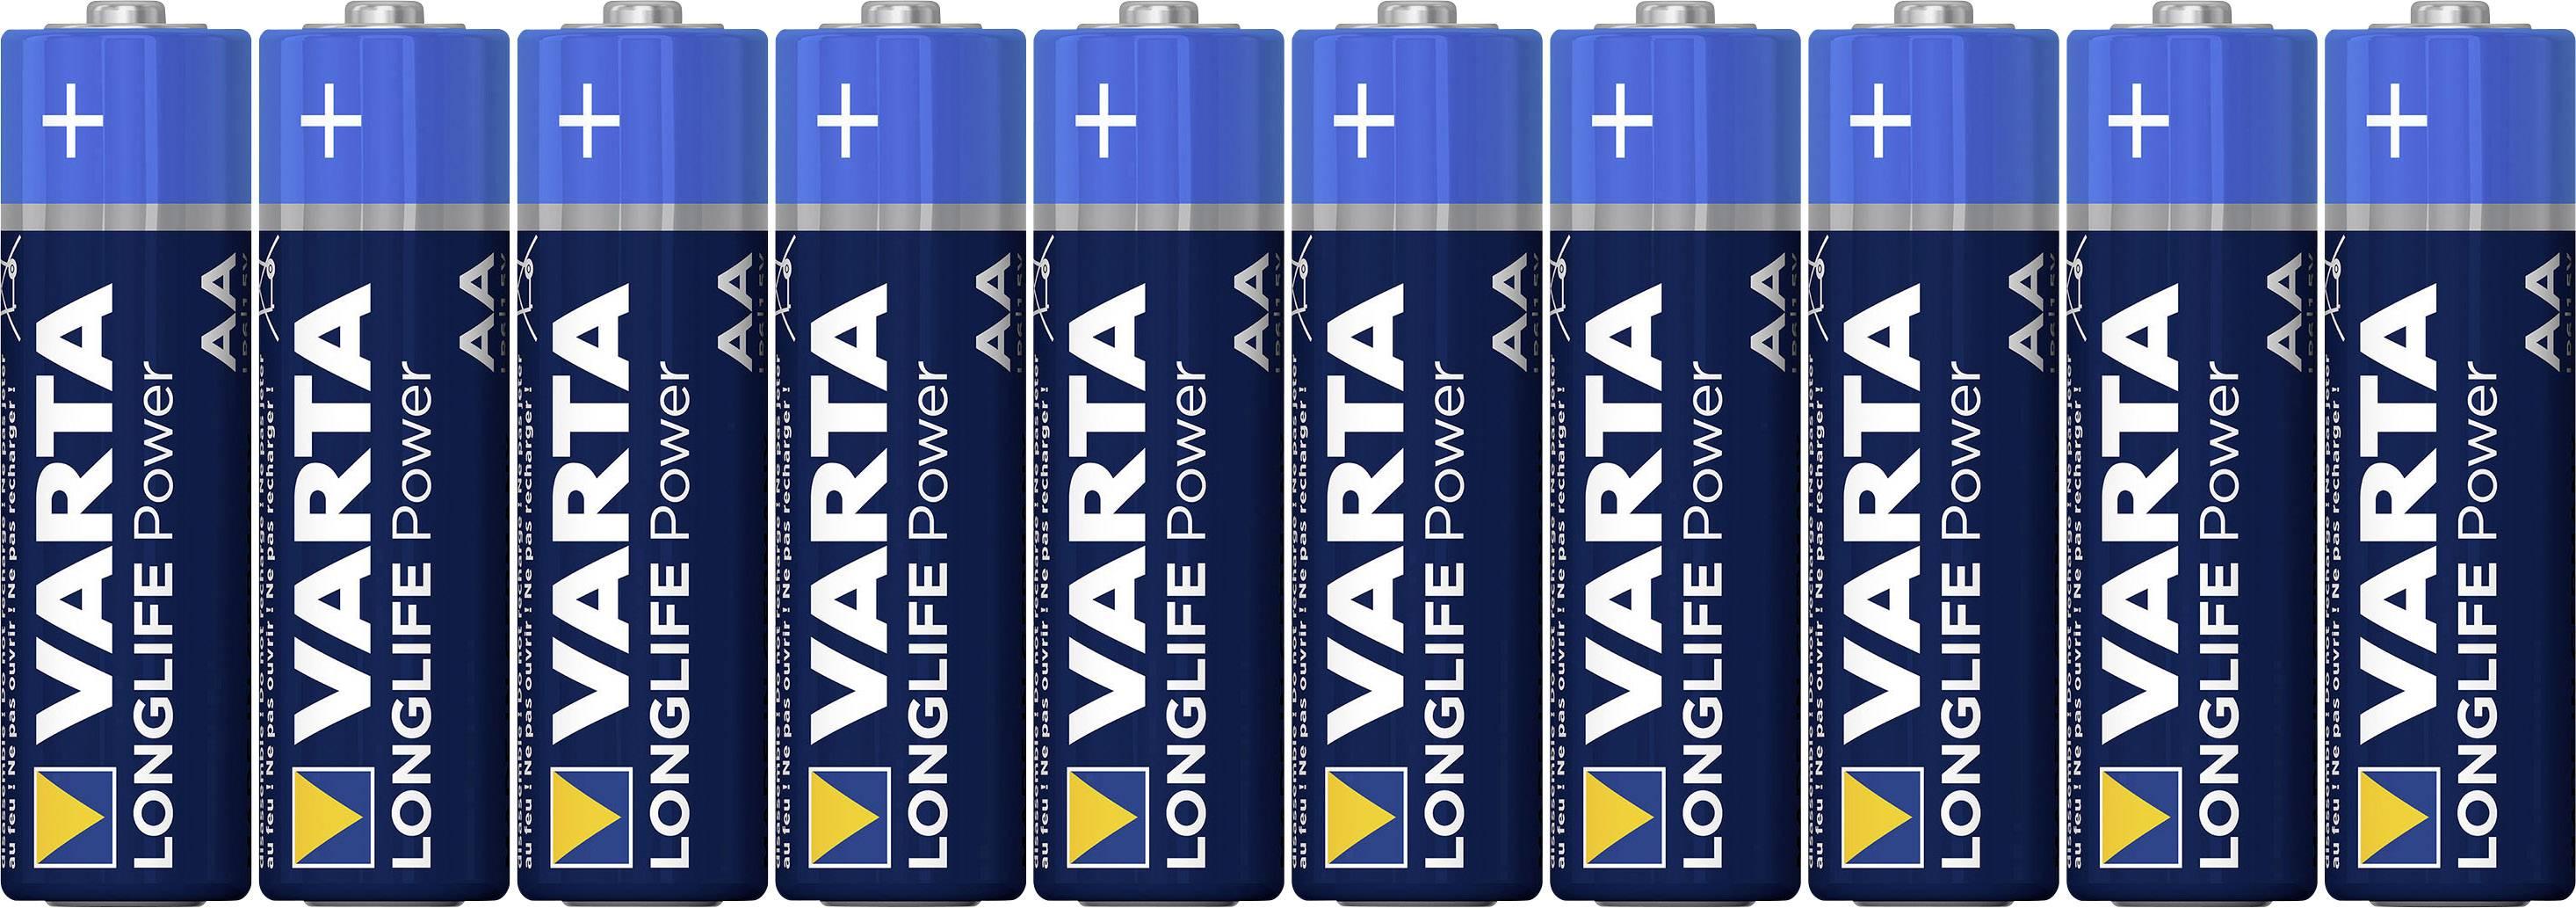 Batéria VARTA High Energy 10 ks, AA, 1,5 V